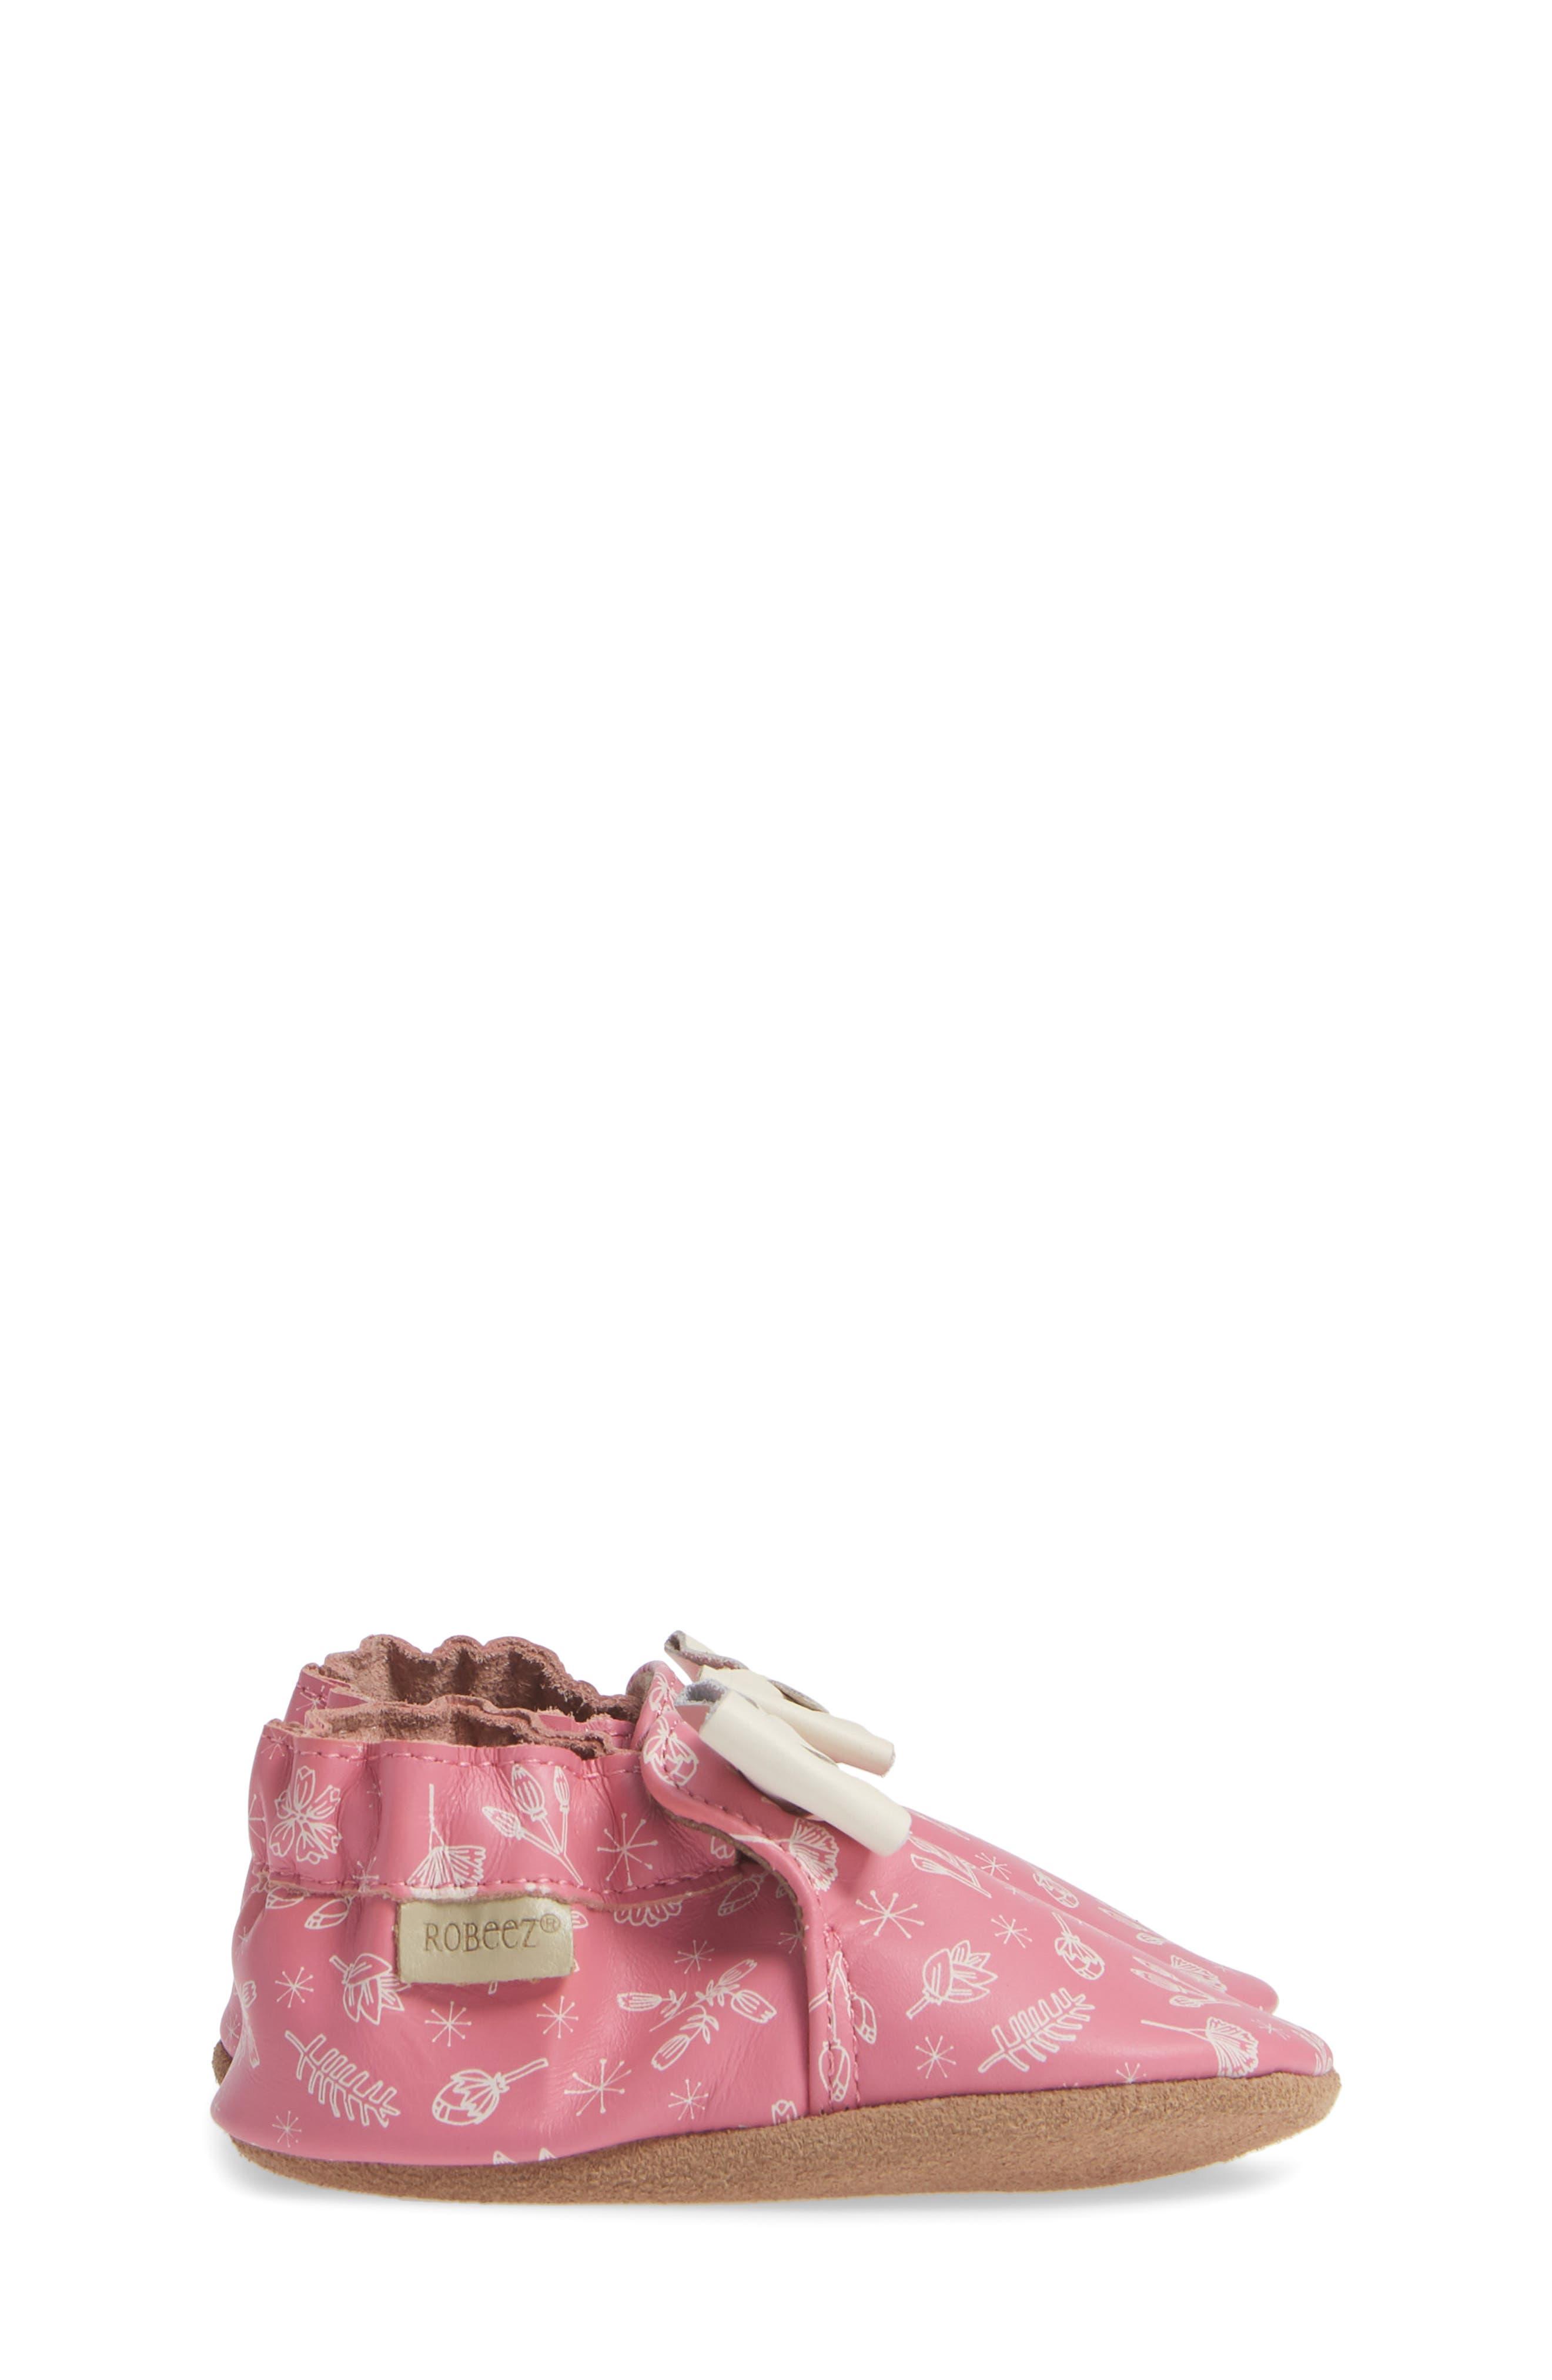 ROBEEZ<SUP>®</SUP>, Francesca Floral Crib Shoe, Alternate thumbnail 4, color, PINK